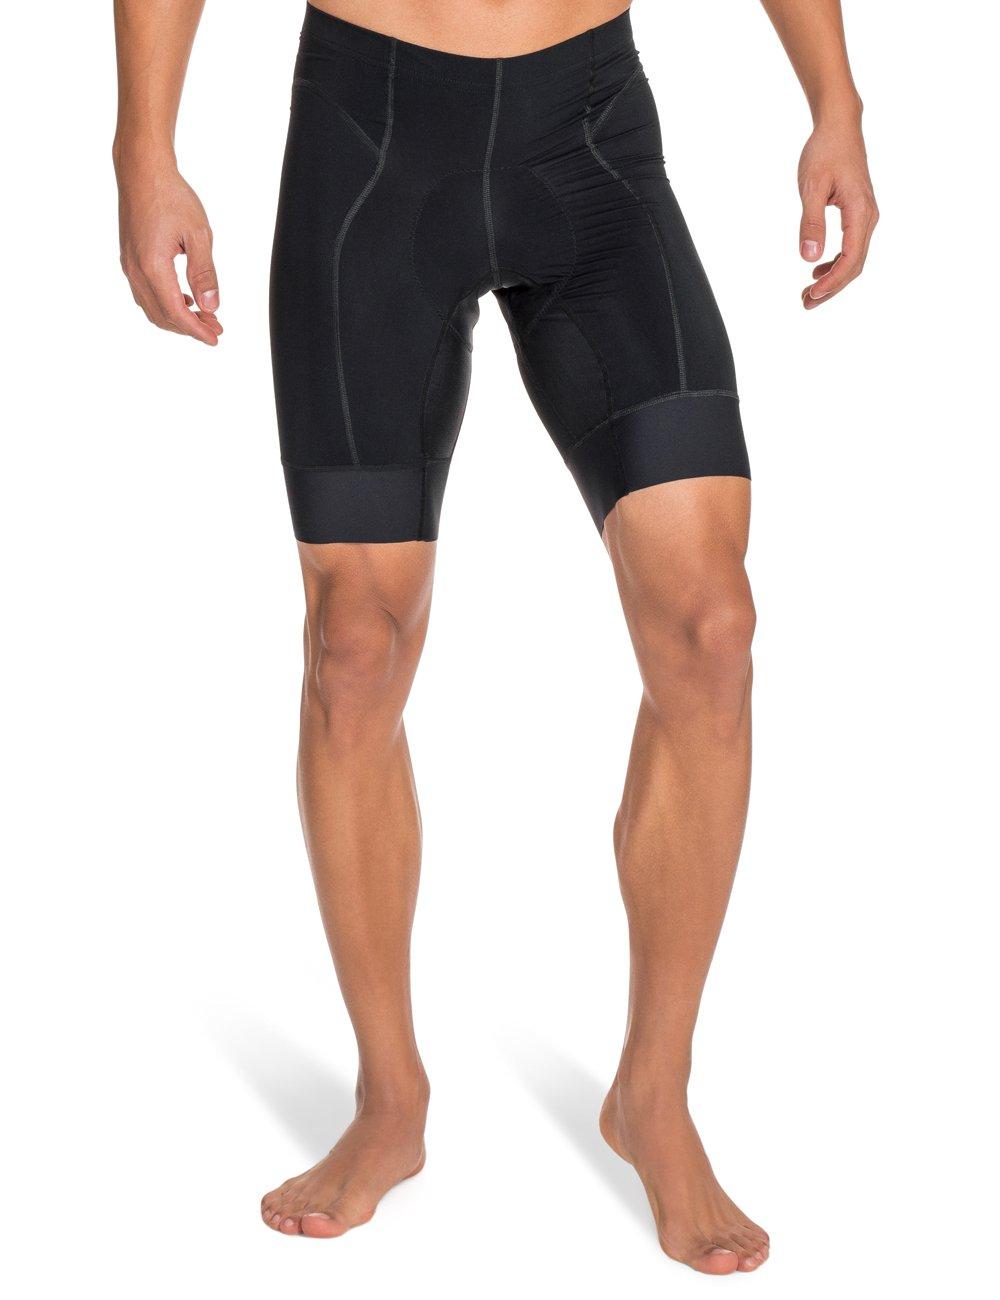 Skins Herren Bib Shorts Cycle Mens, Schwarz, XL, C85001053